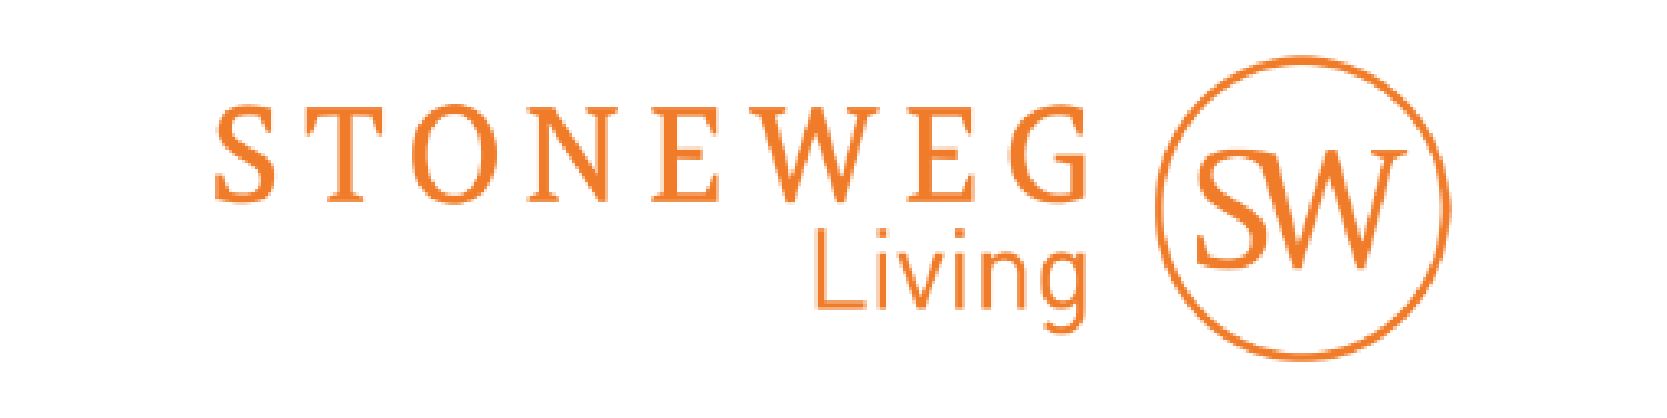 roi-real-estate-stoneweb-living